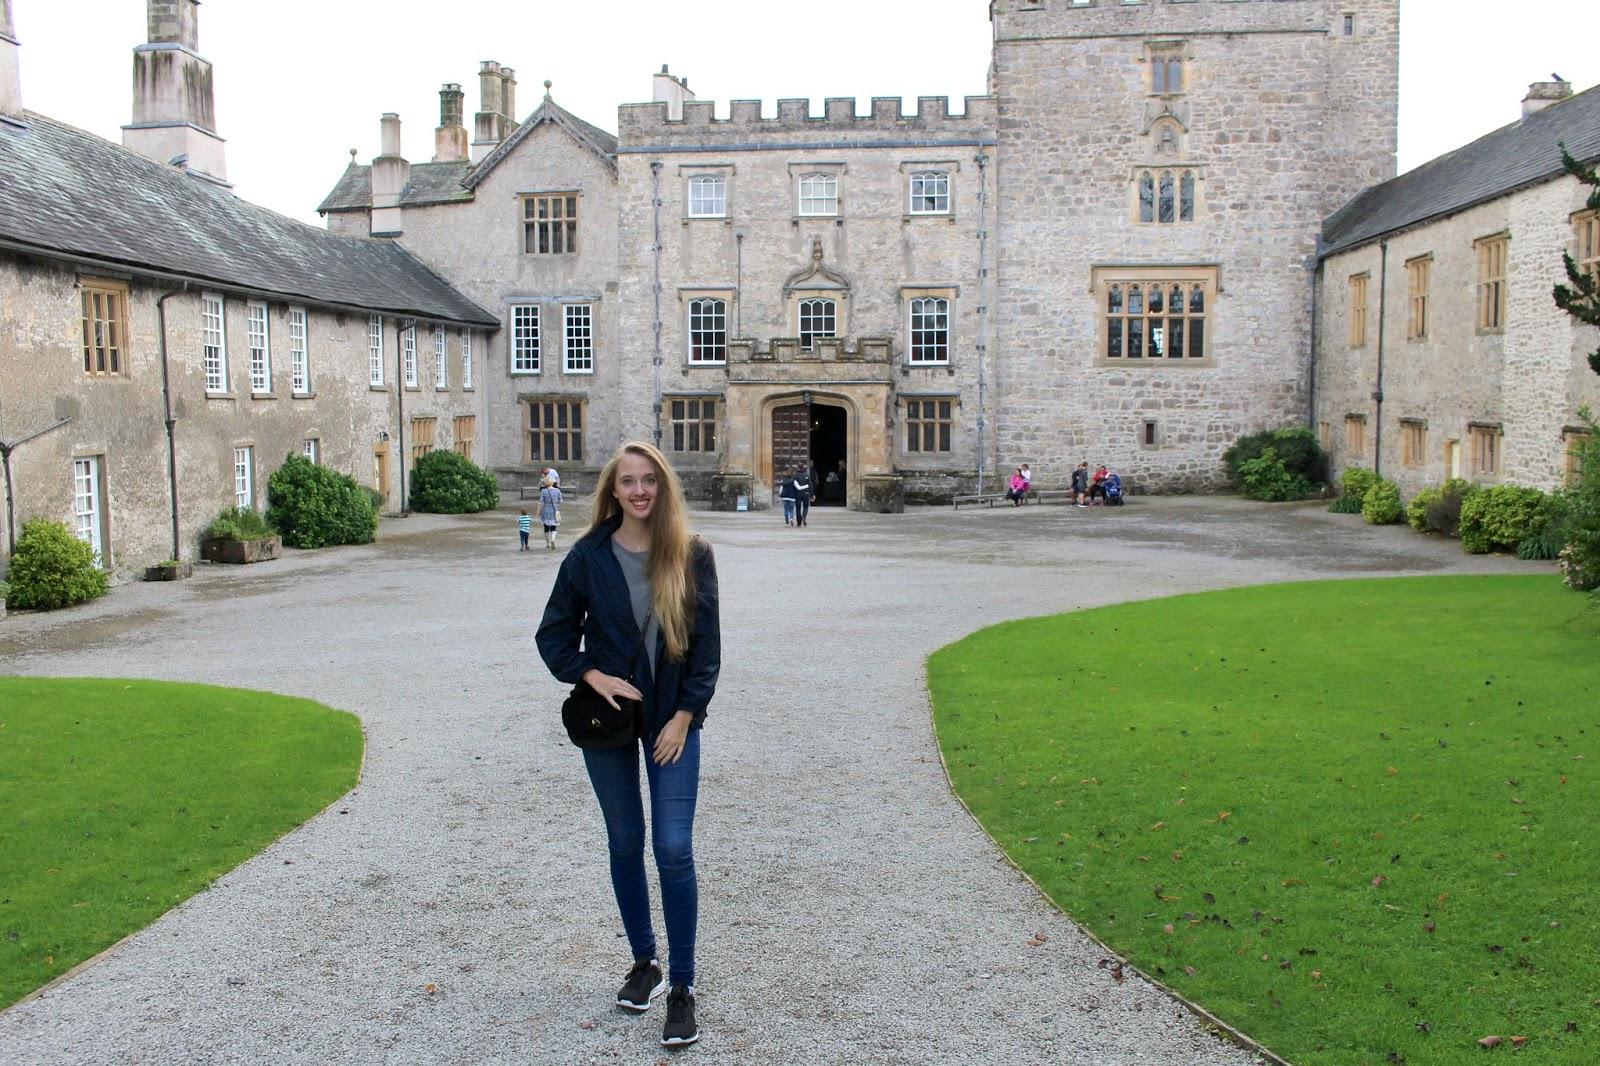 Travel blogger visit to Lake District Sizergh Castle